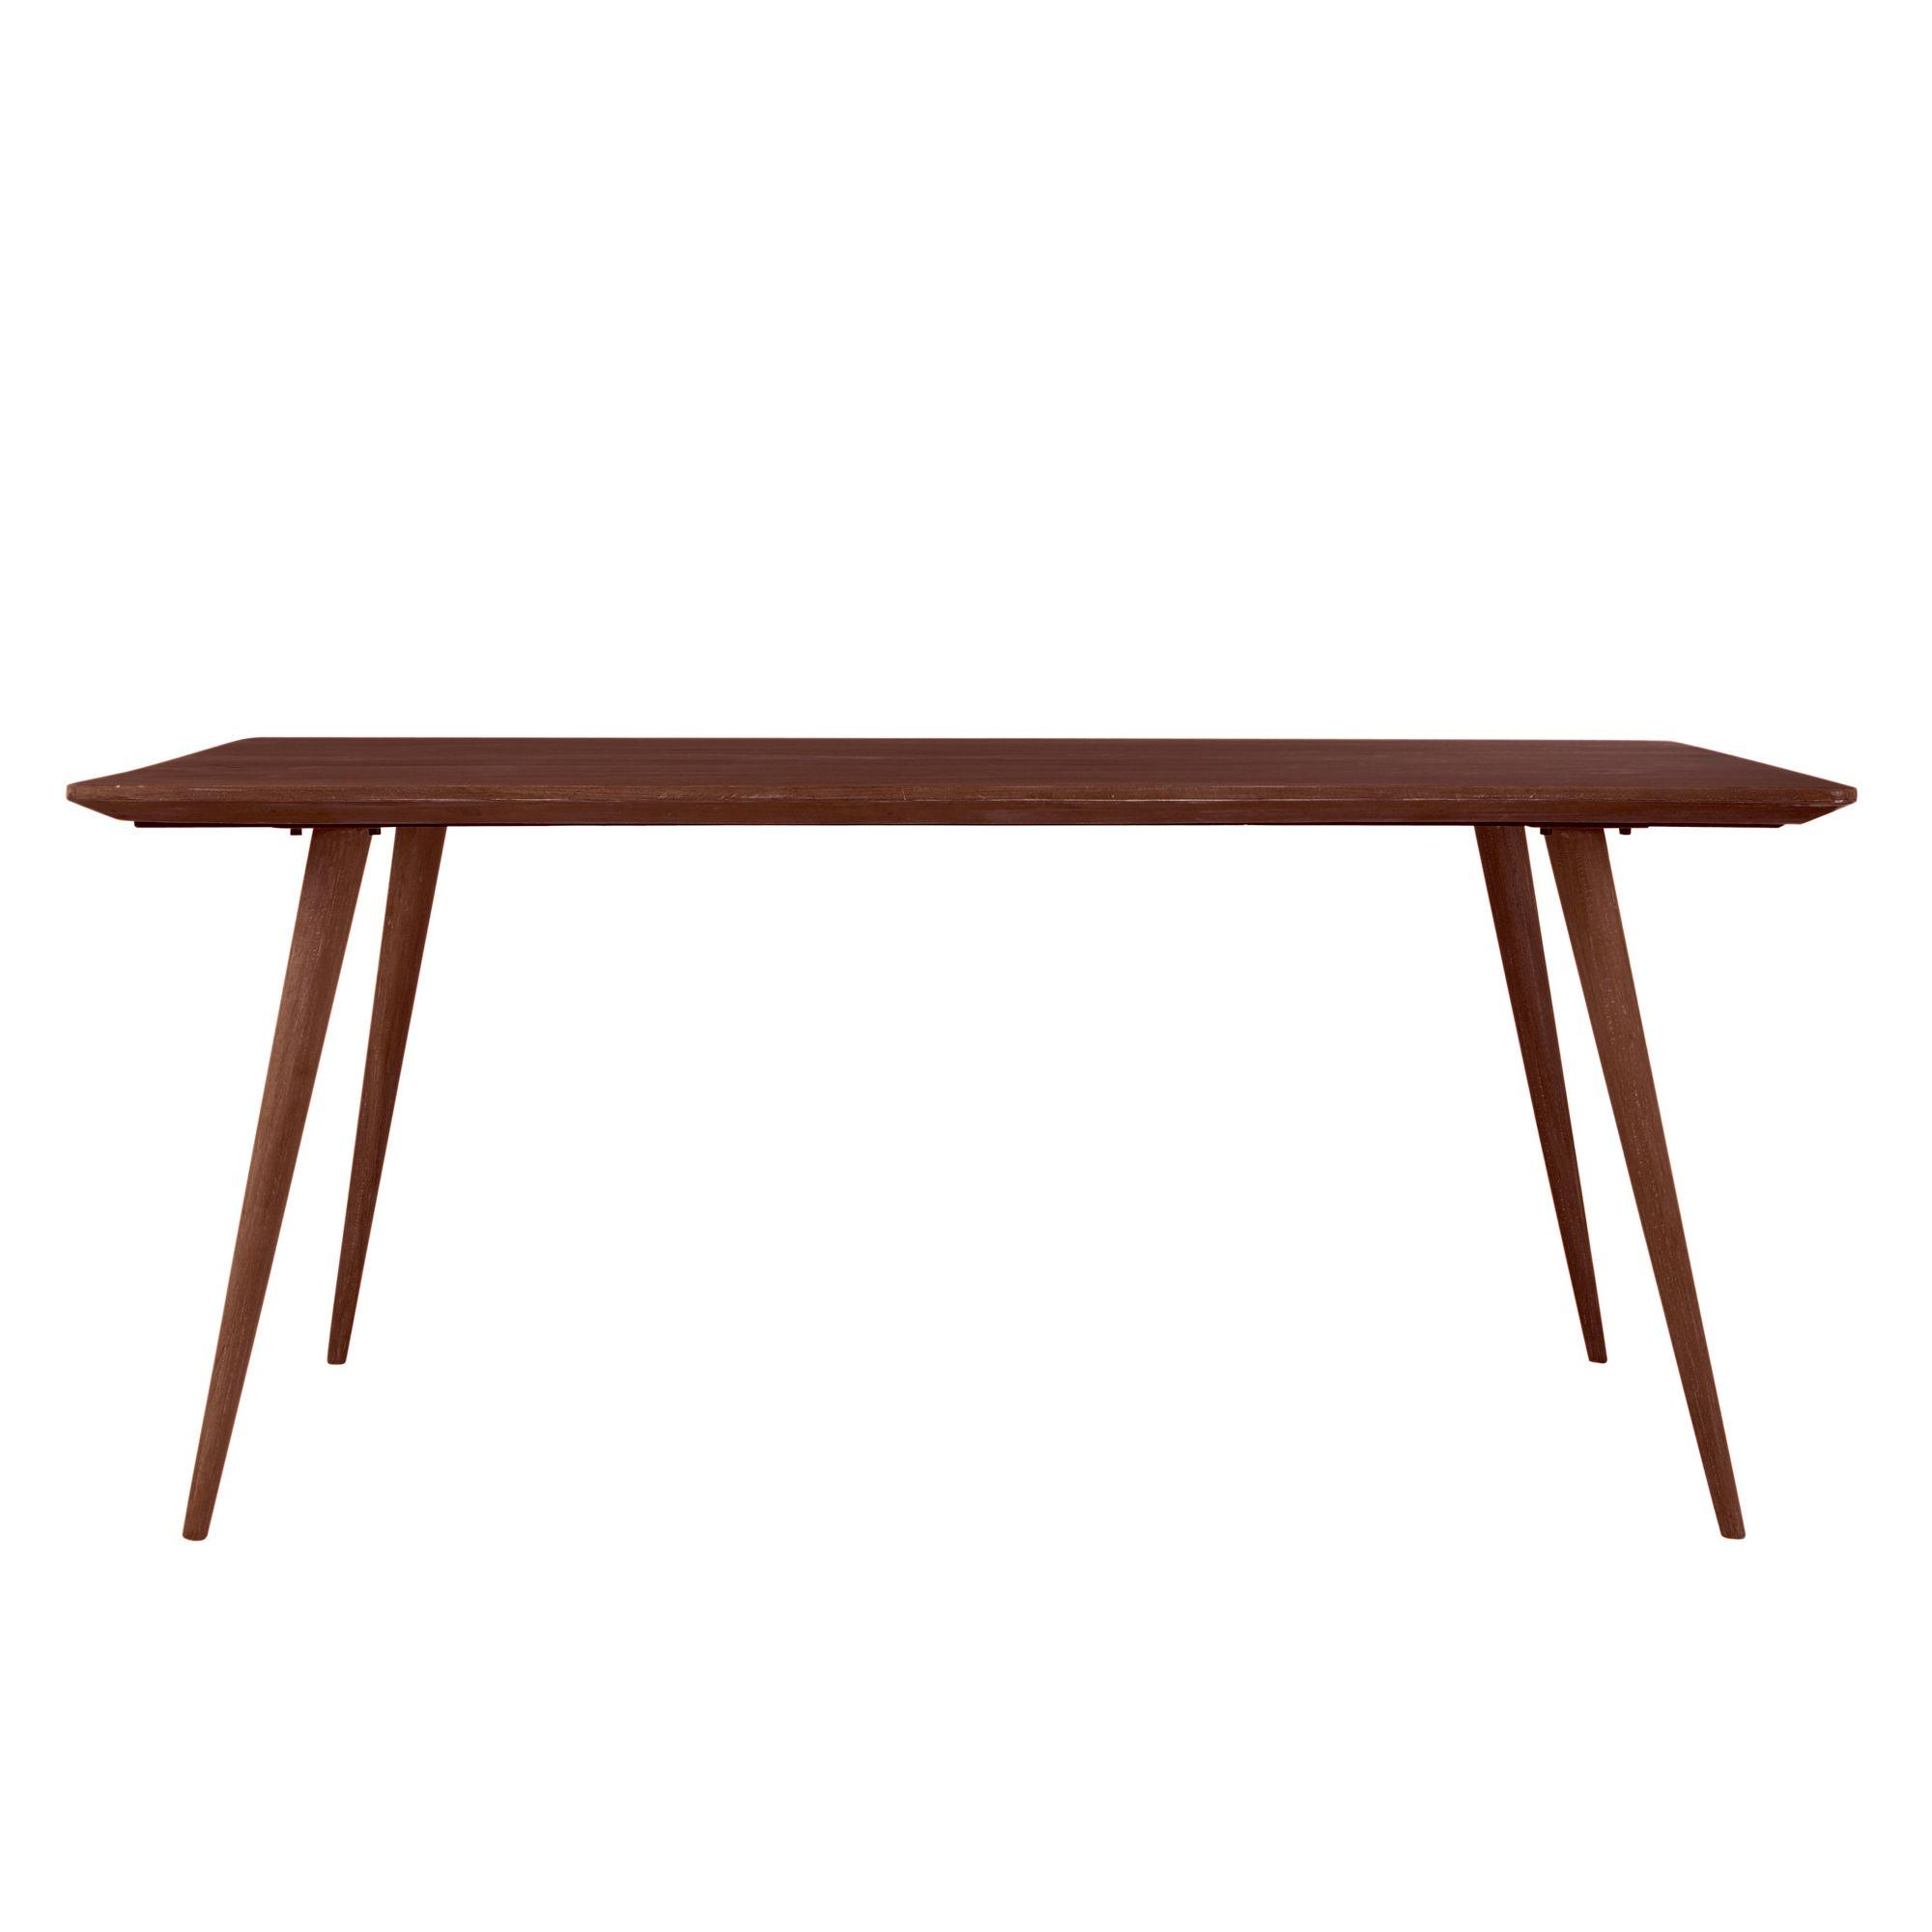 Mesa de comedor vintage de madera maciza de palo rosa An. 175 cm ...